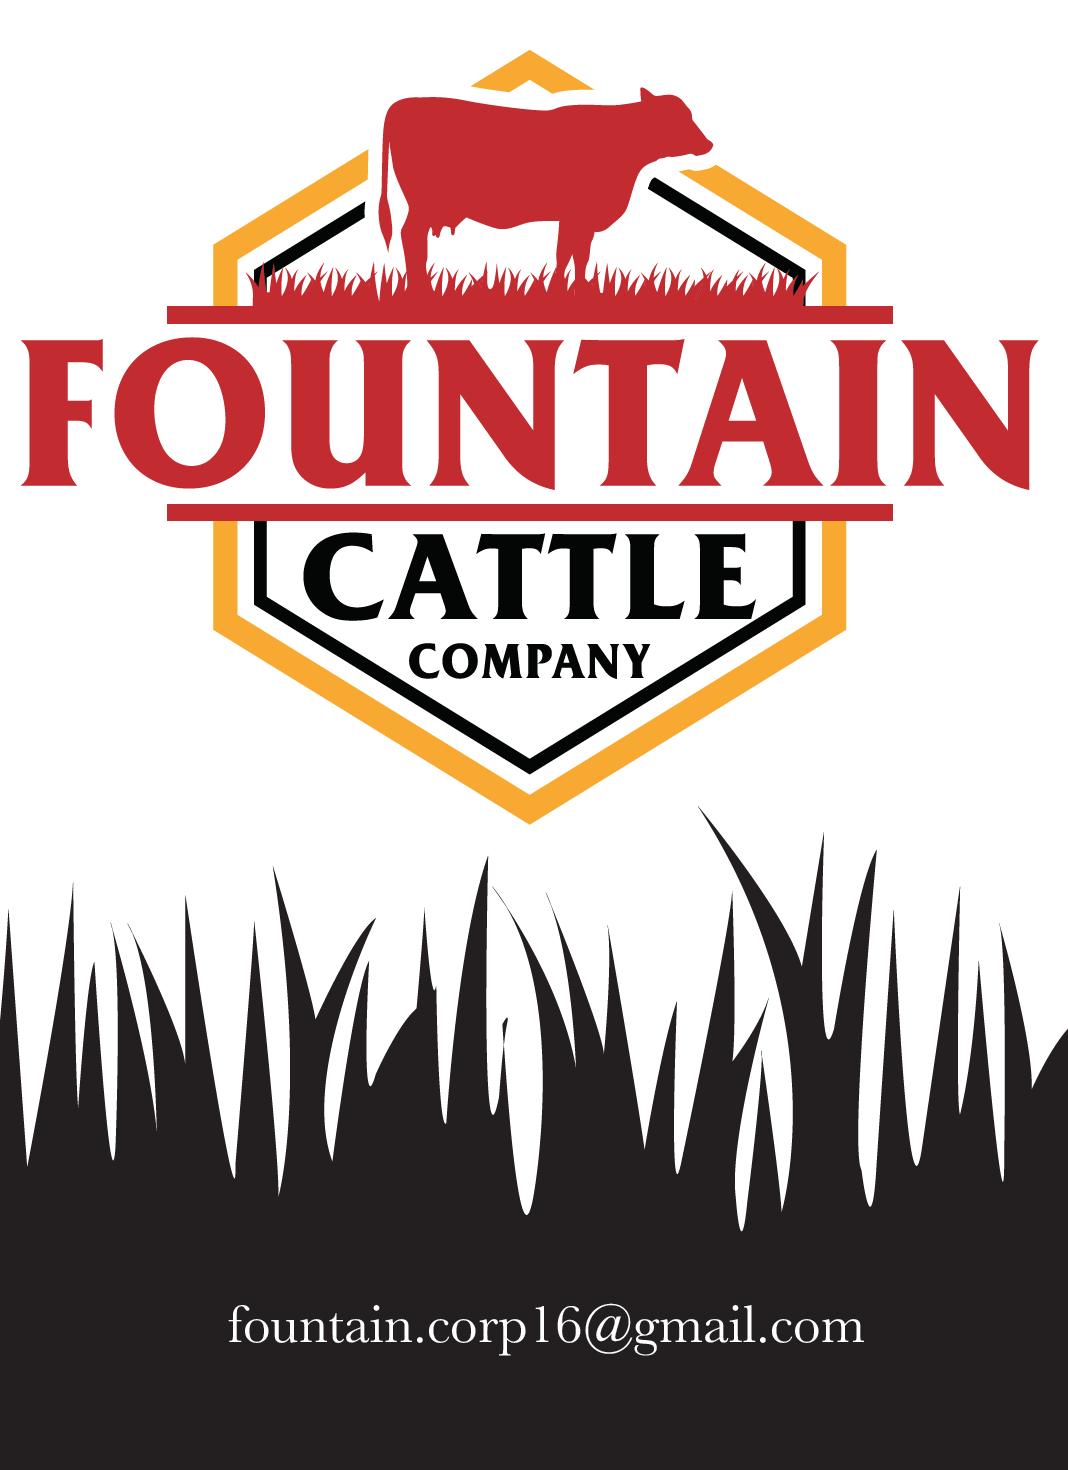 Fountain+Cattle+Company